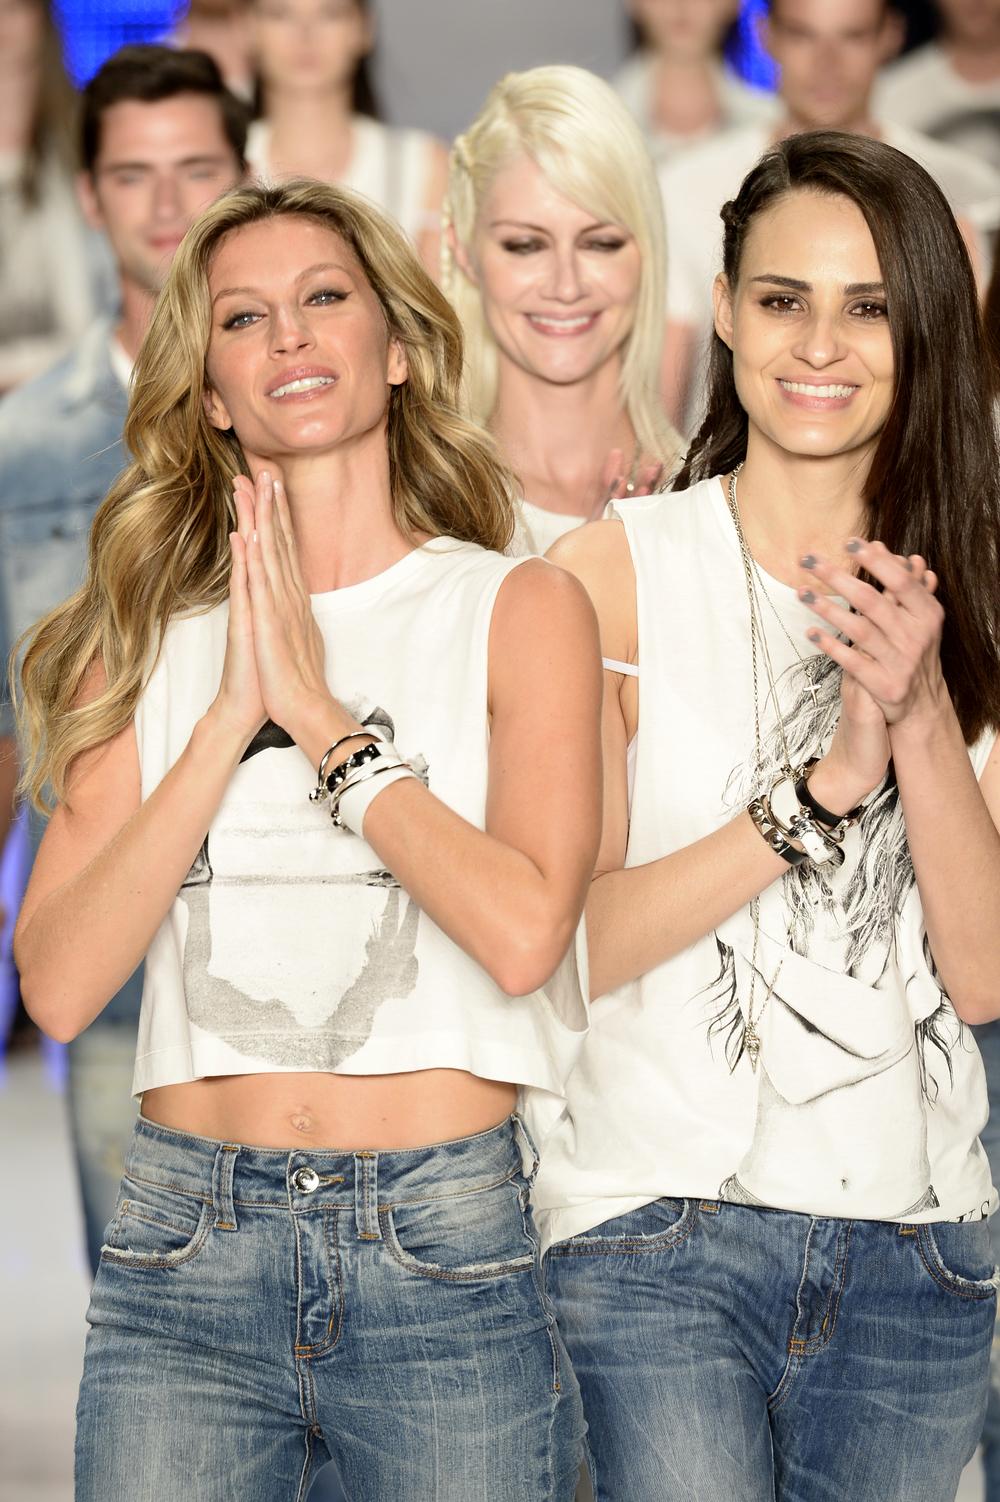 Colcci - Gisele Bundchen and Fernanda Tavares